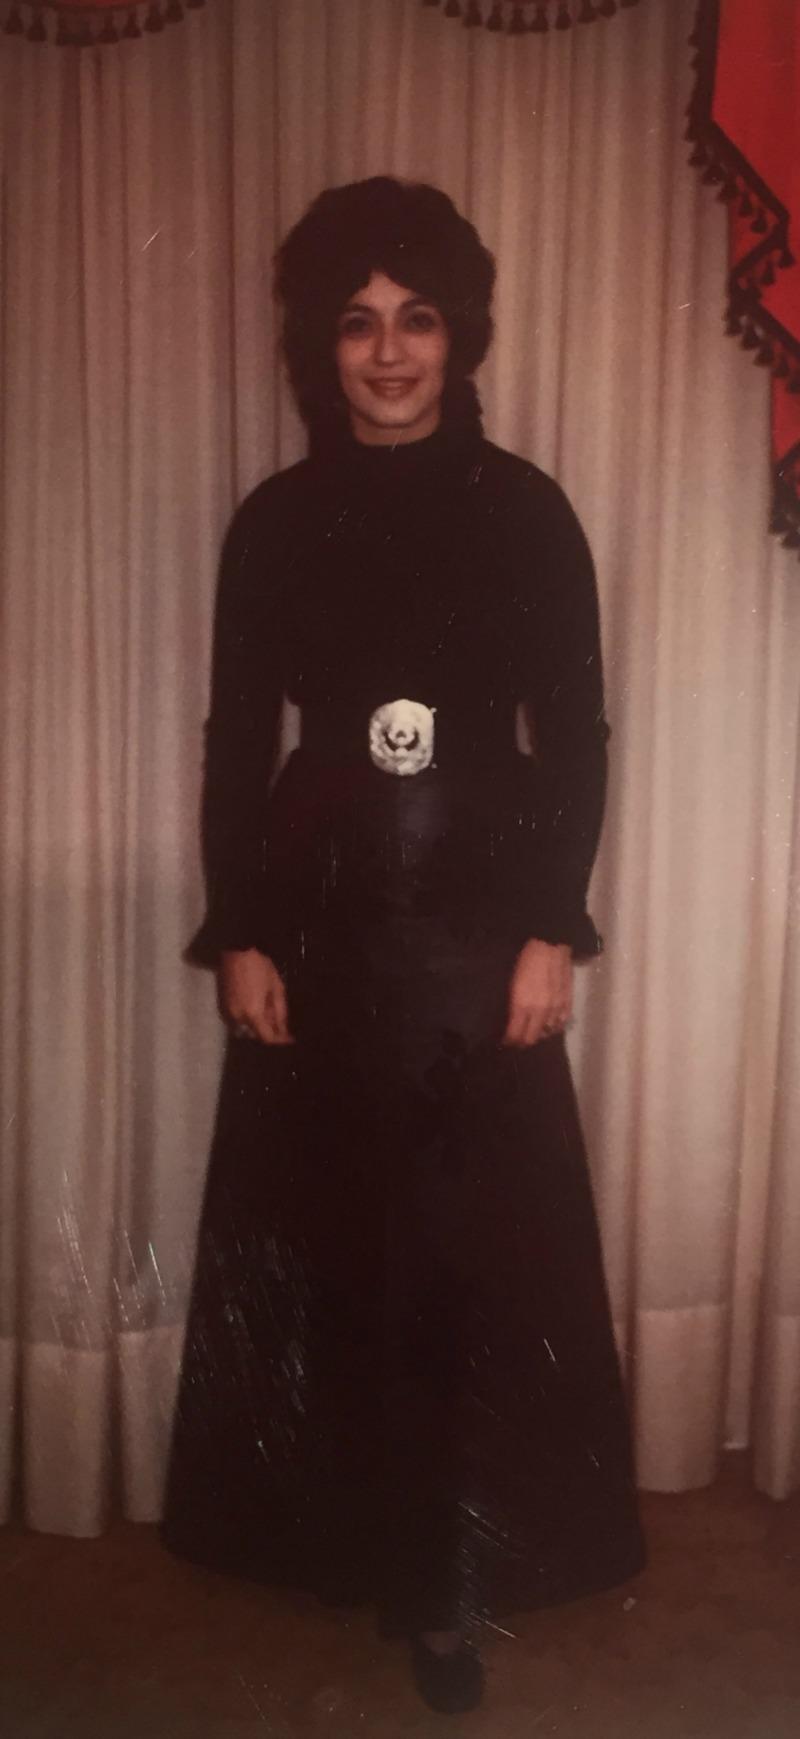 mom1971